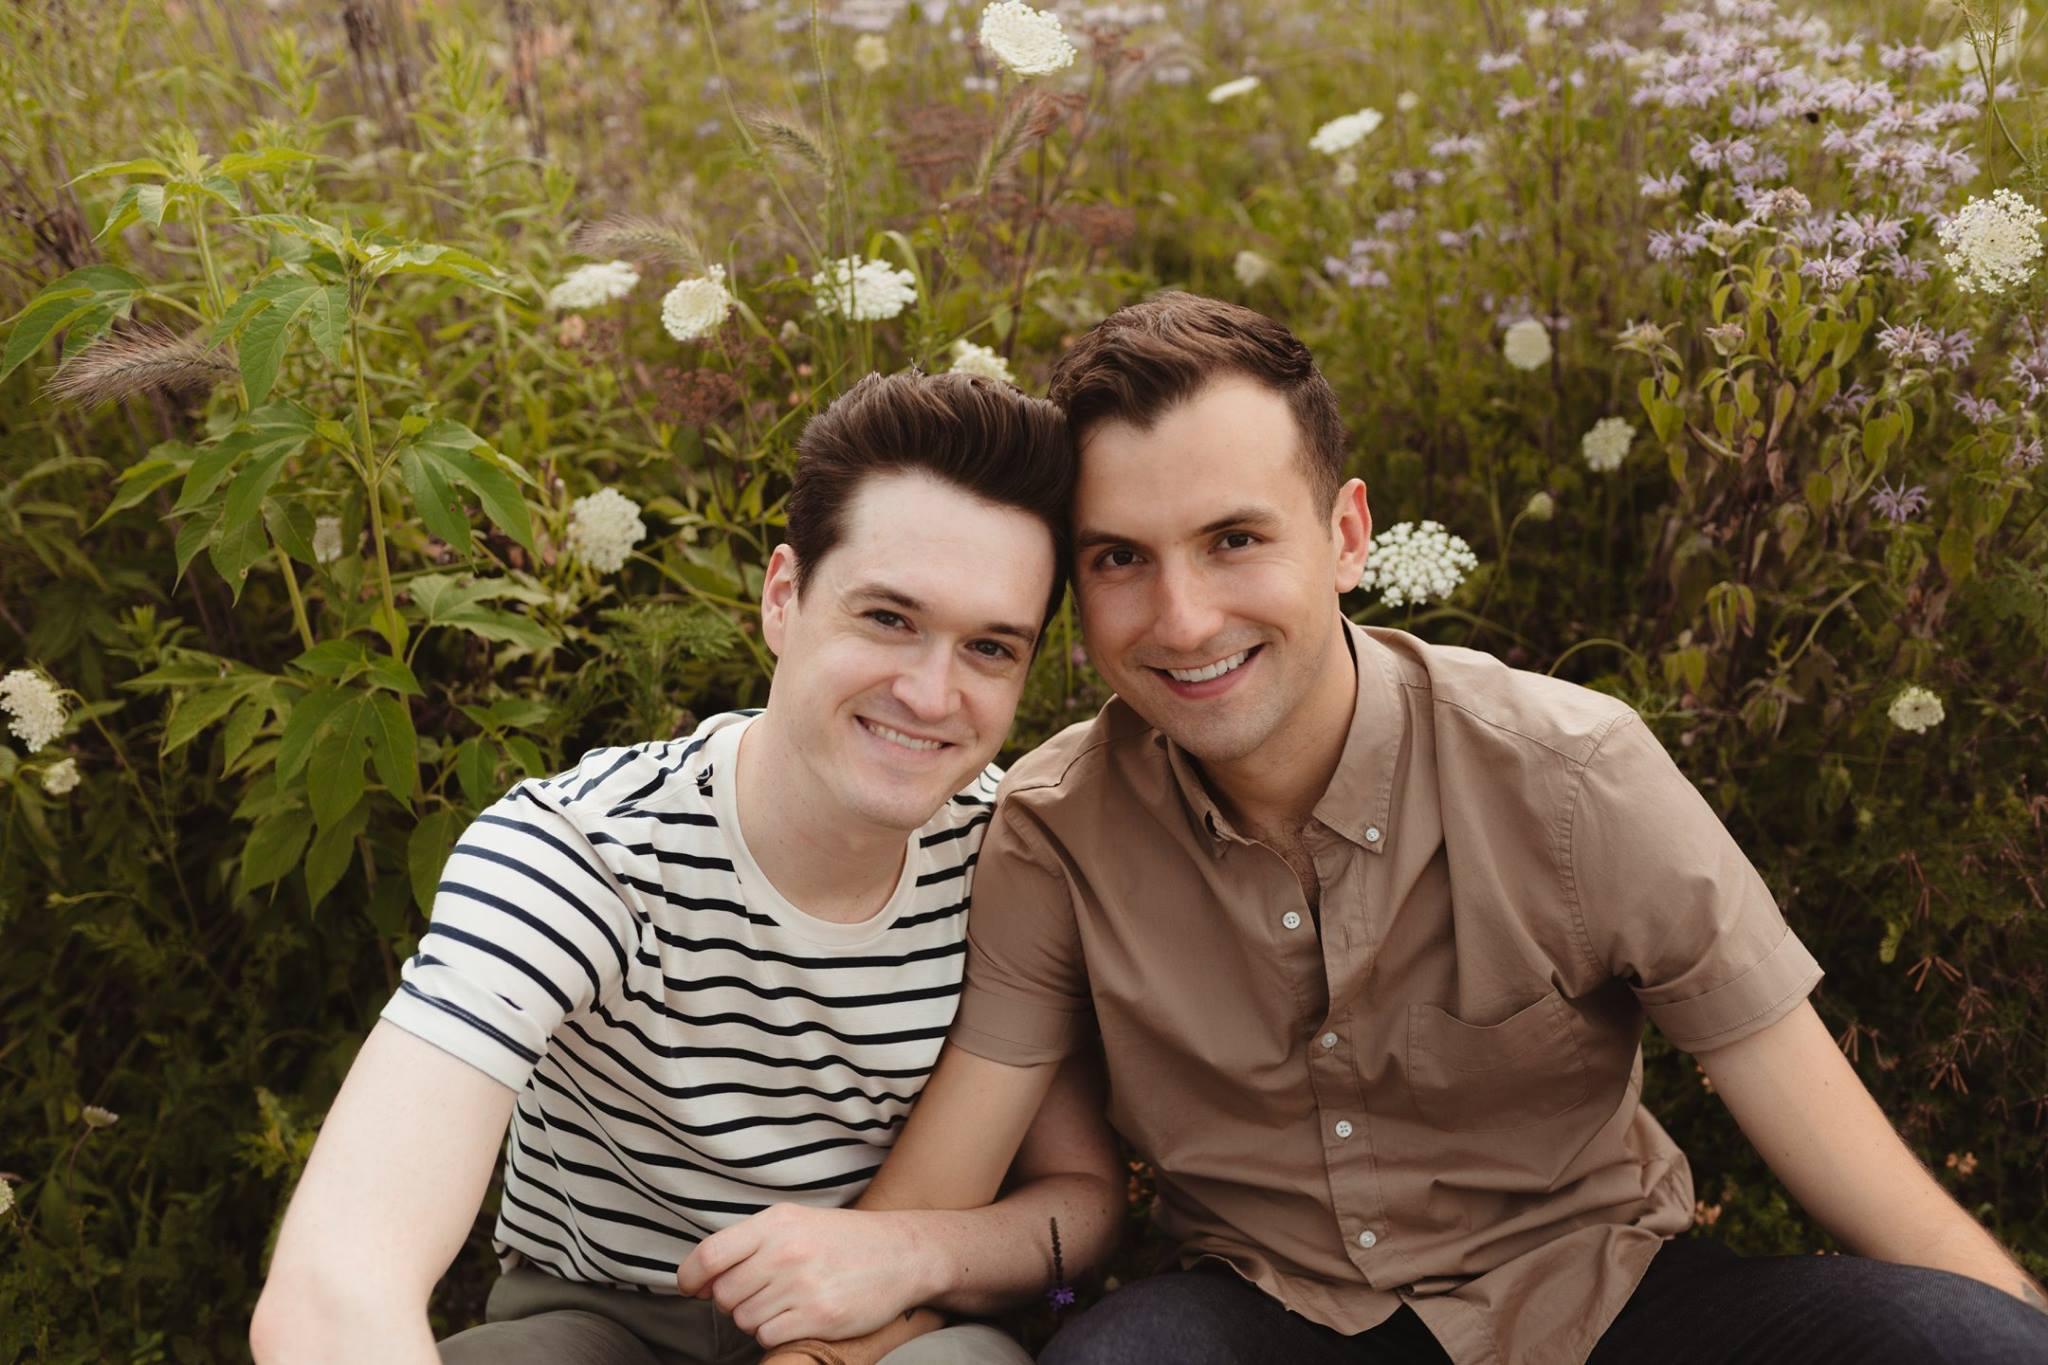 Andrew & Aidan (Photo: LK Photography)